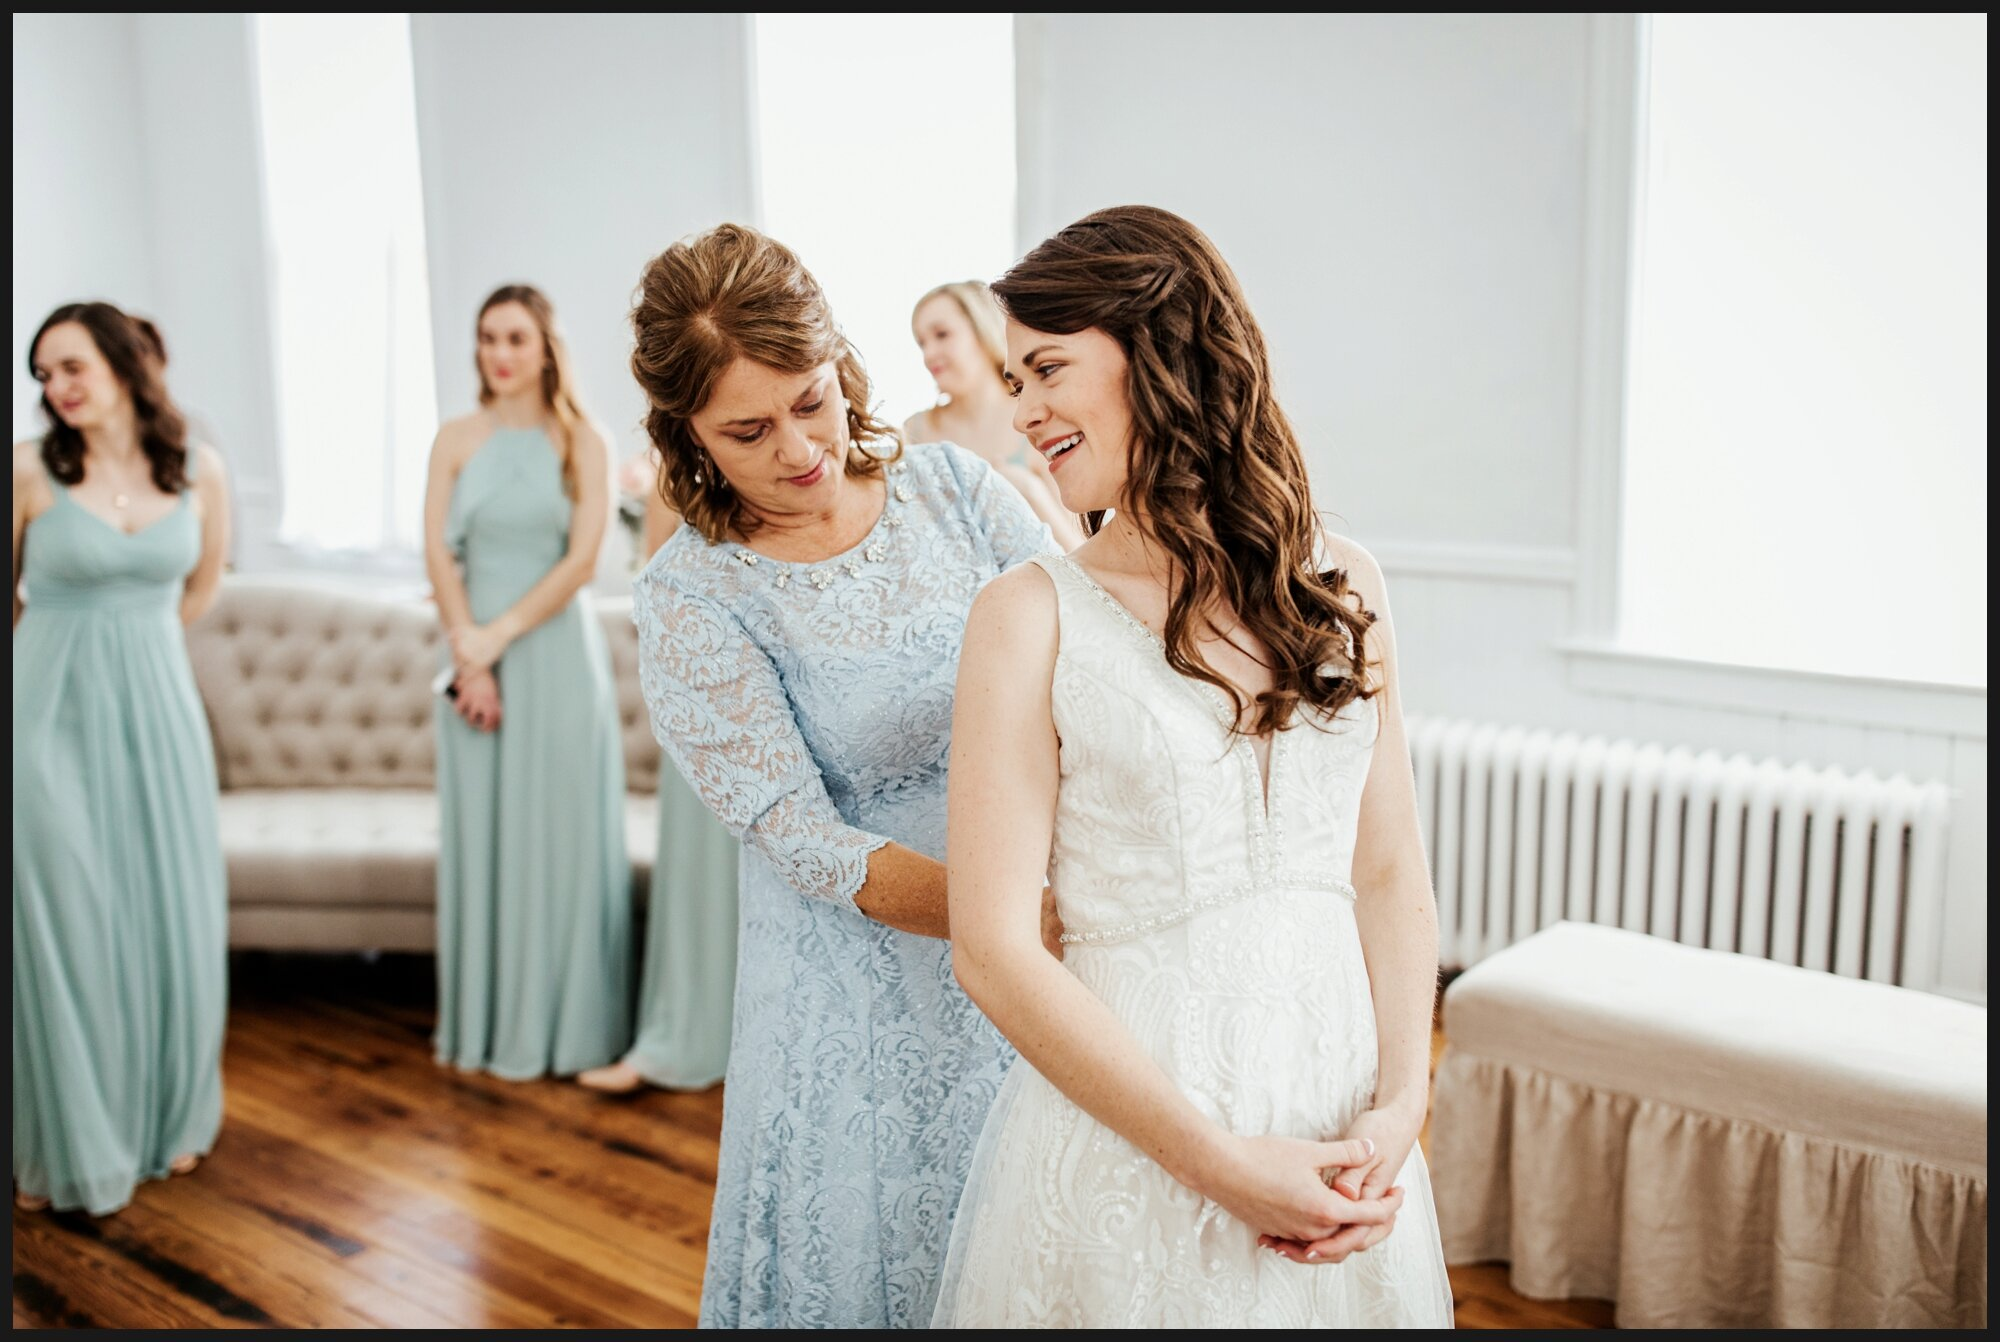 Orlando-Wedding-Photographer-destination-wedding-photographer-florida-wedding-photographer-hawaii-wedding-photographer_0652.jpg